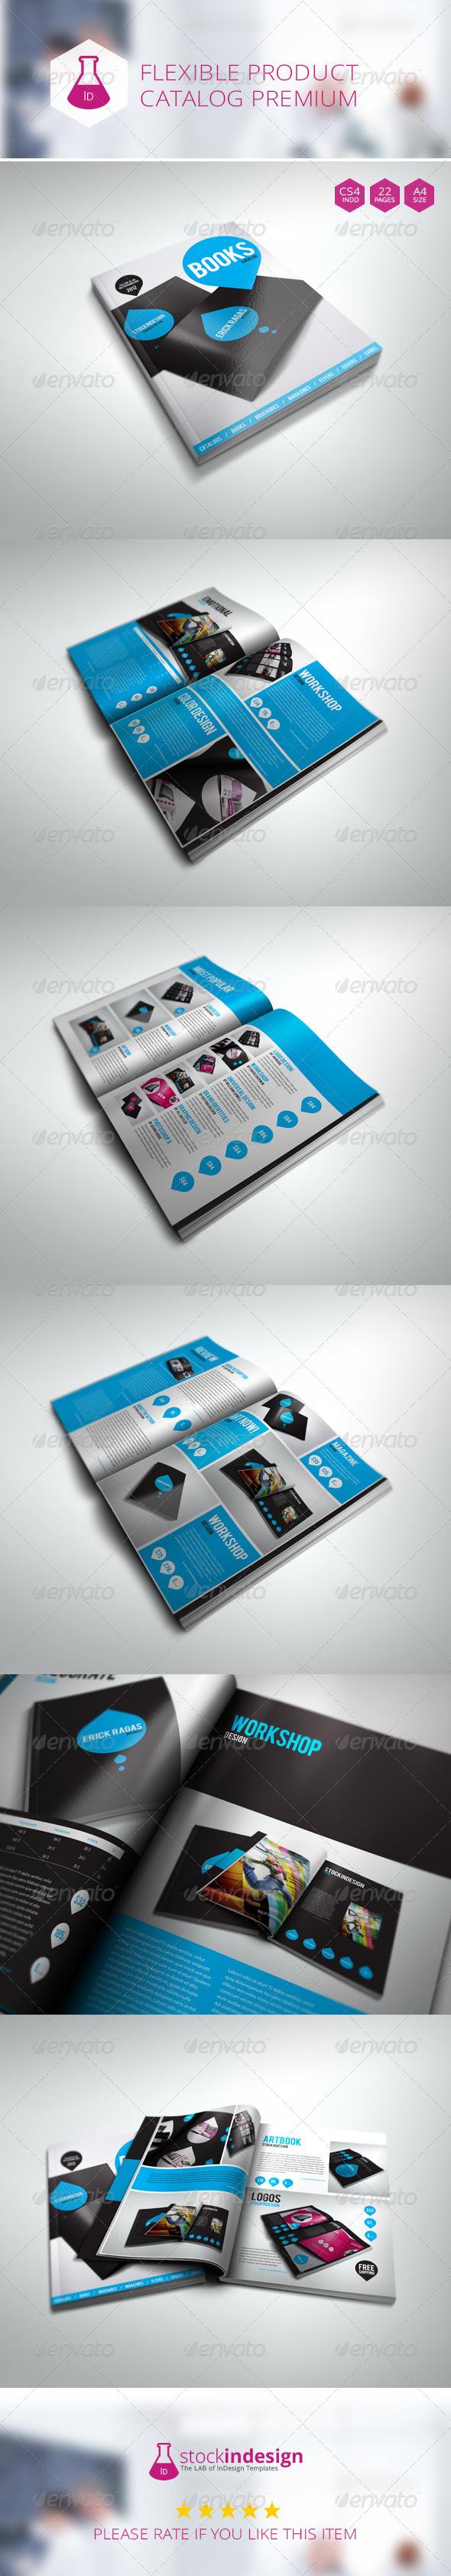 Flexible Product Catalog Premium - Catalogs Brochures